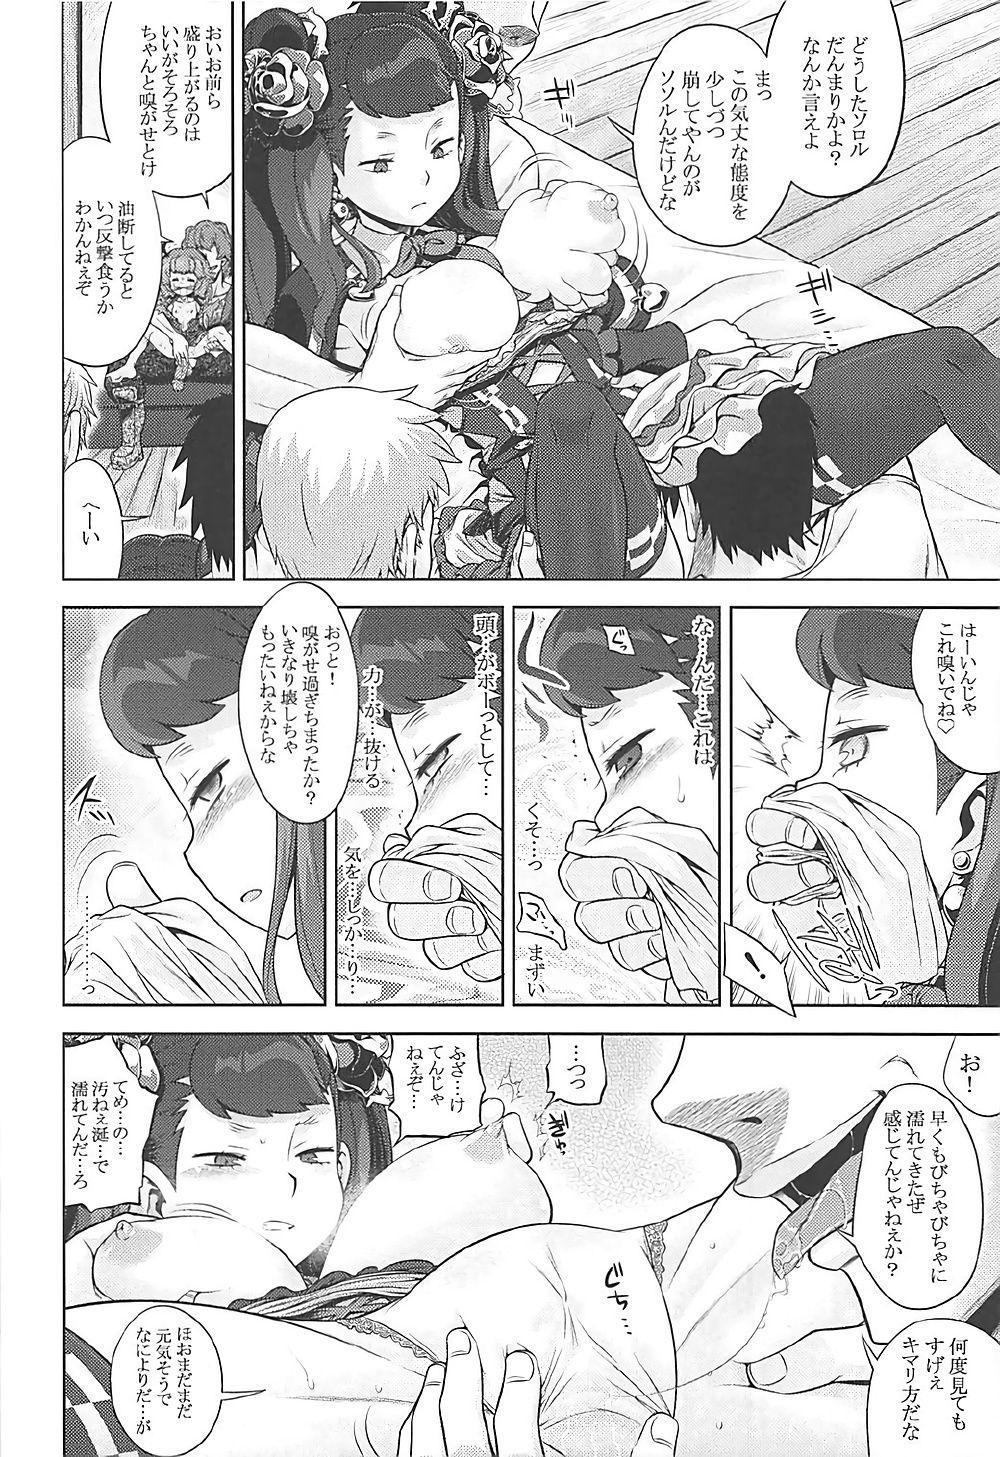 Sekaiju no Anone 29 Lilisoro Hard 4